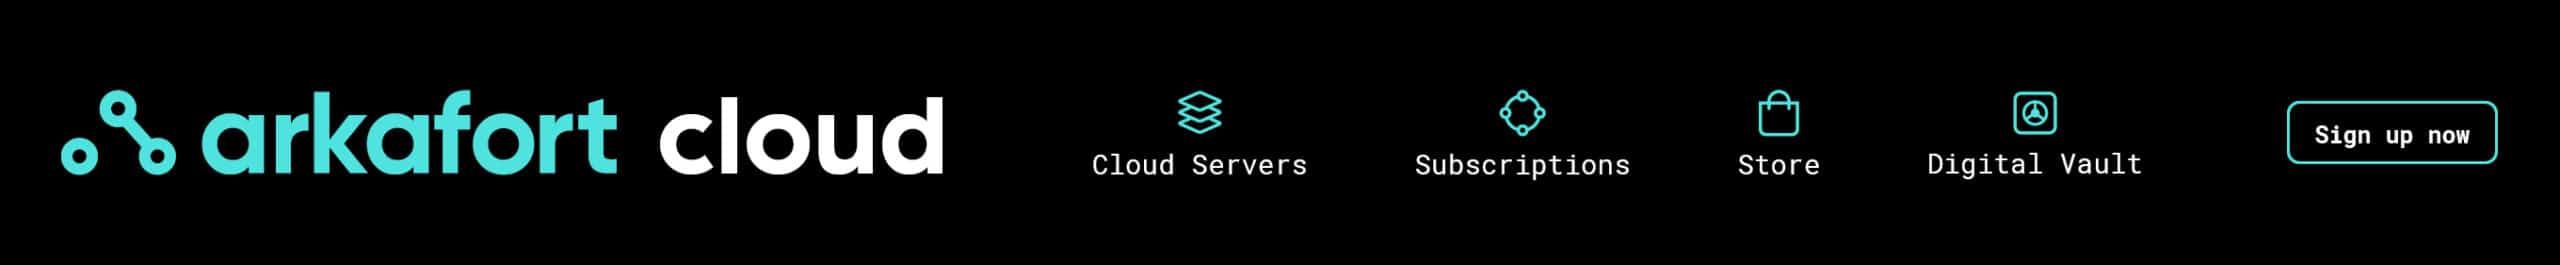 Arkafort Cloud Leaderboard